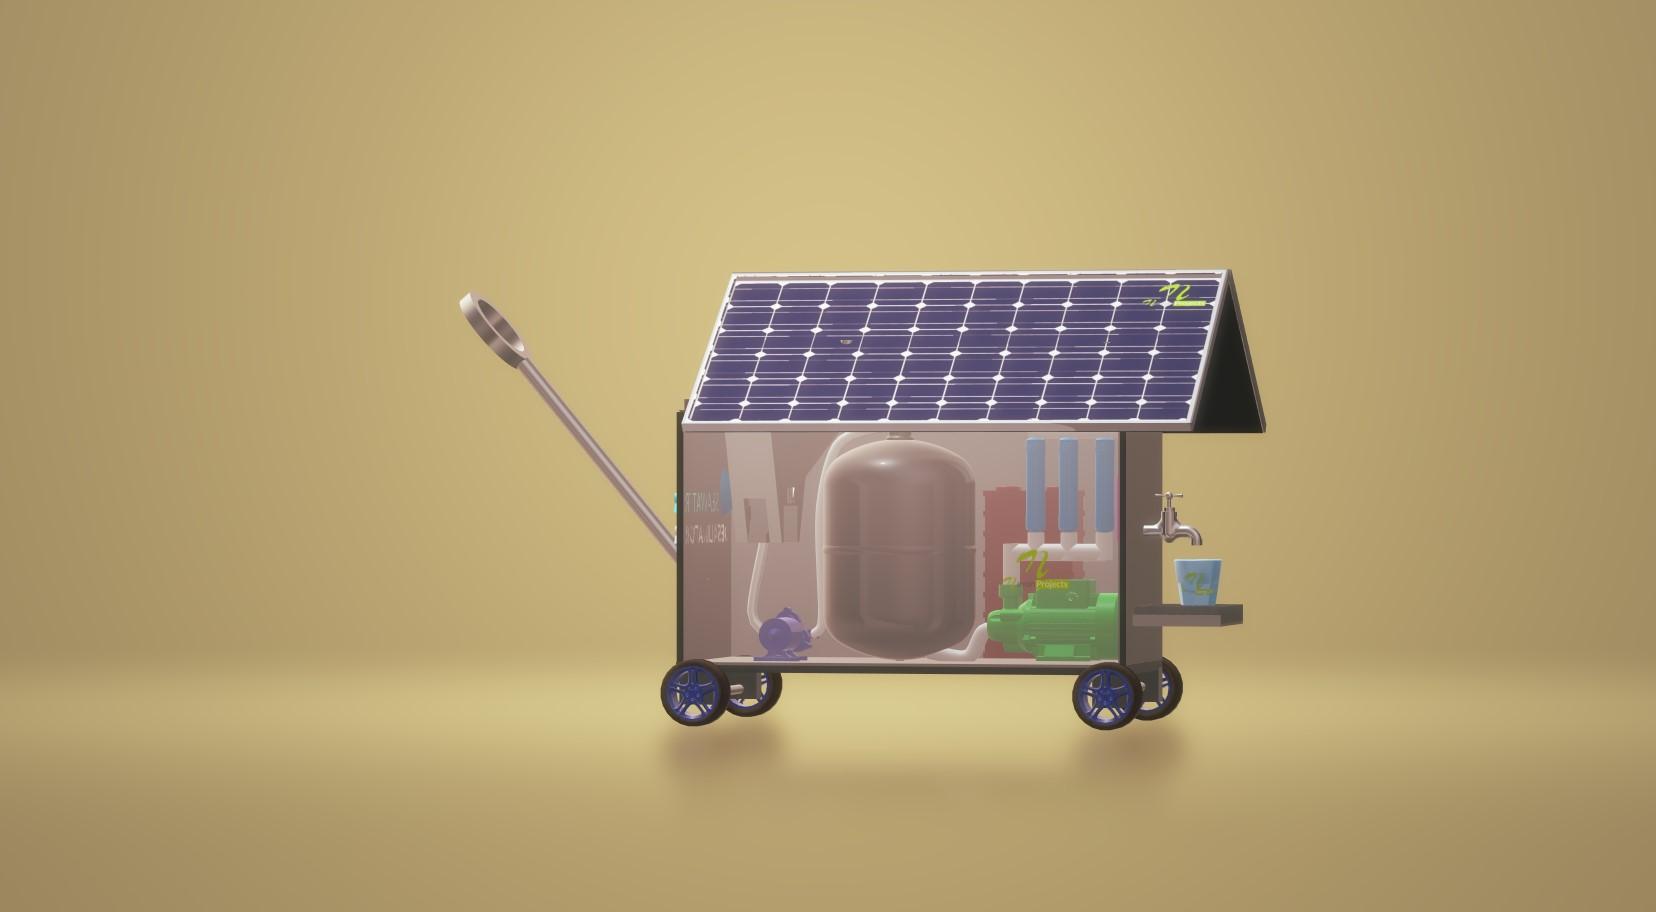 nevon solar seawater purifier